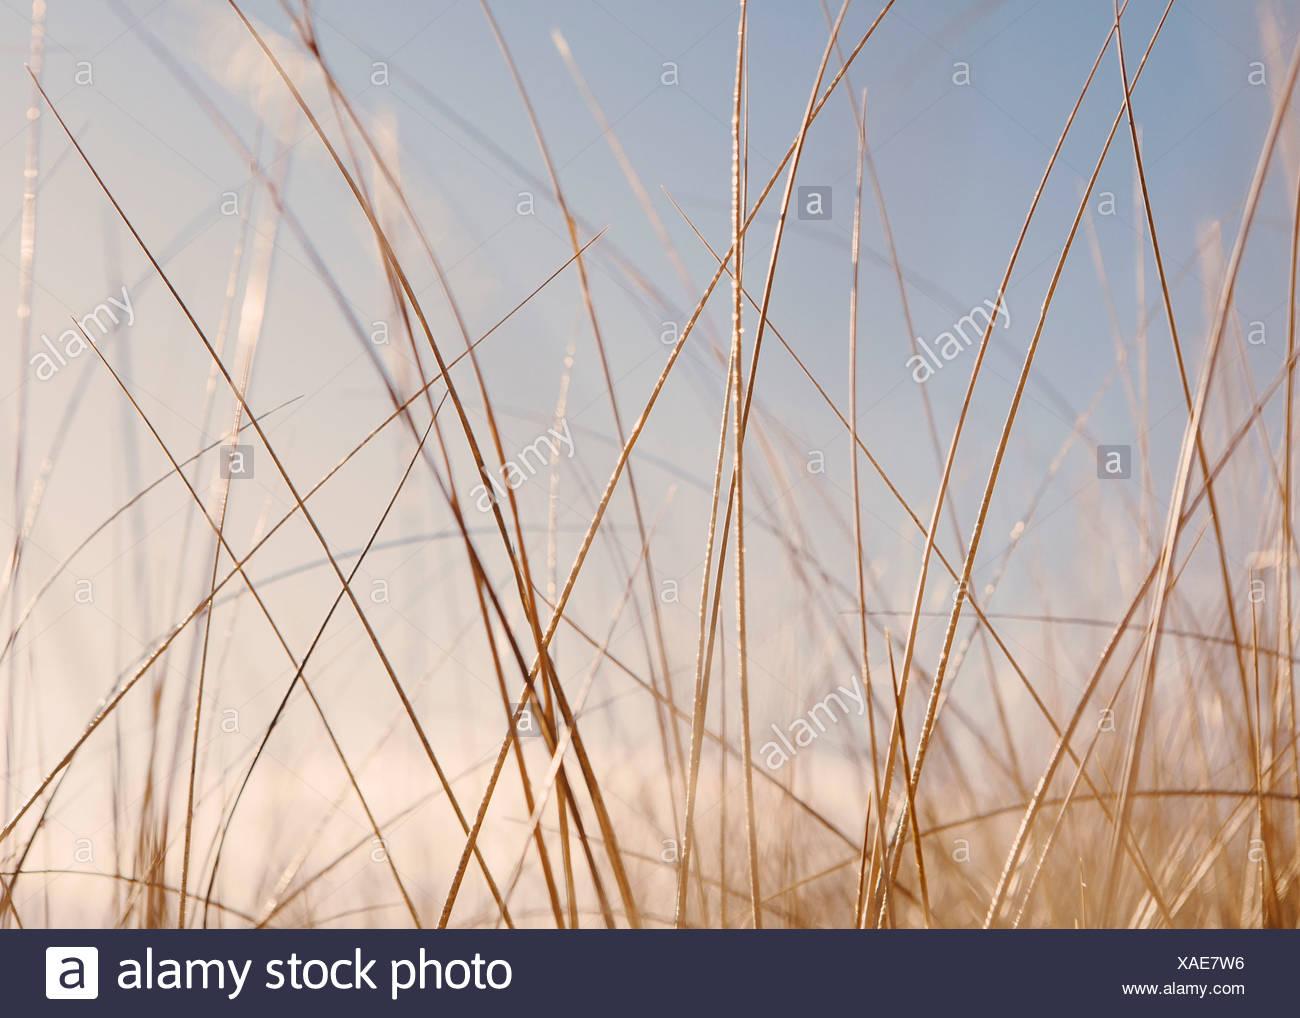 Sea grasses on Long Beach Peninsula, on the coast of Washington state. Stock Photo